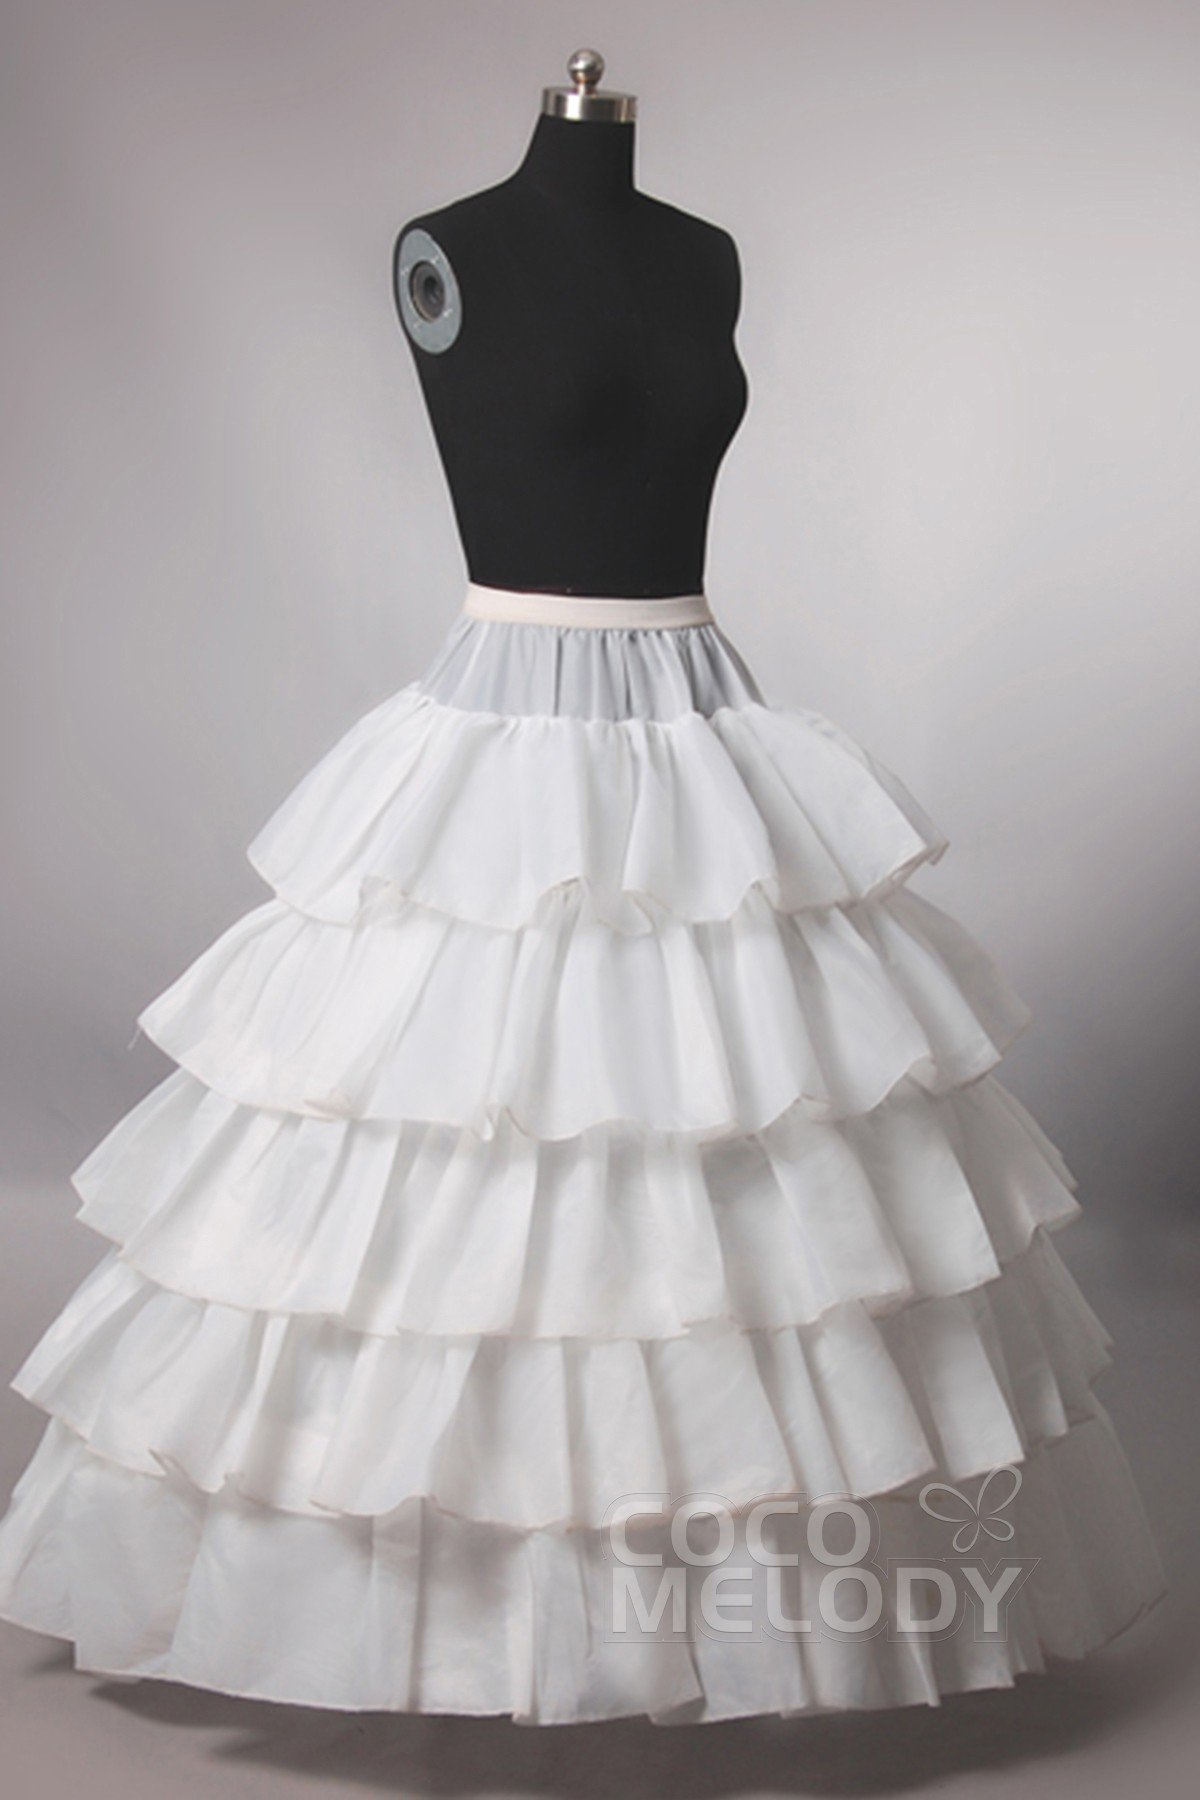 Ball Gown Floor-Length Medium Fullness Slip 4 Hoops Polyester Taffeta Wedding Petticoats CP0013009